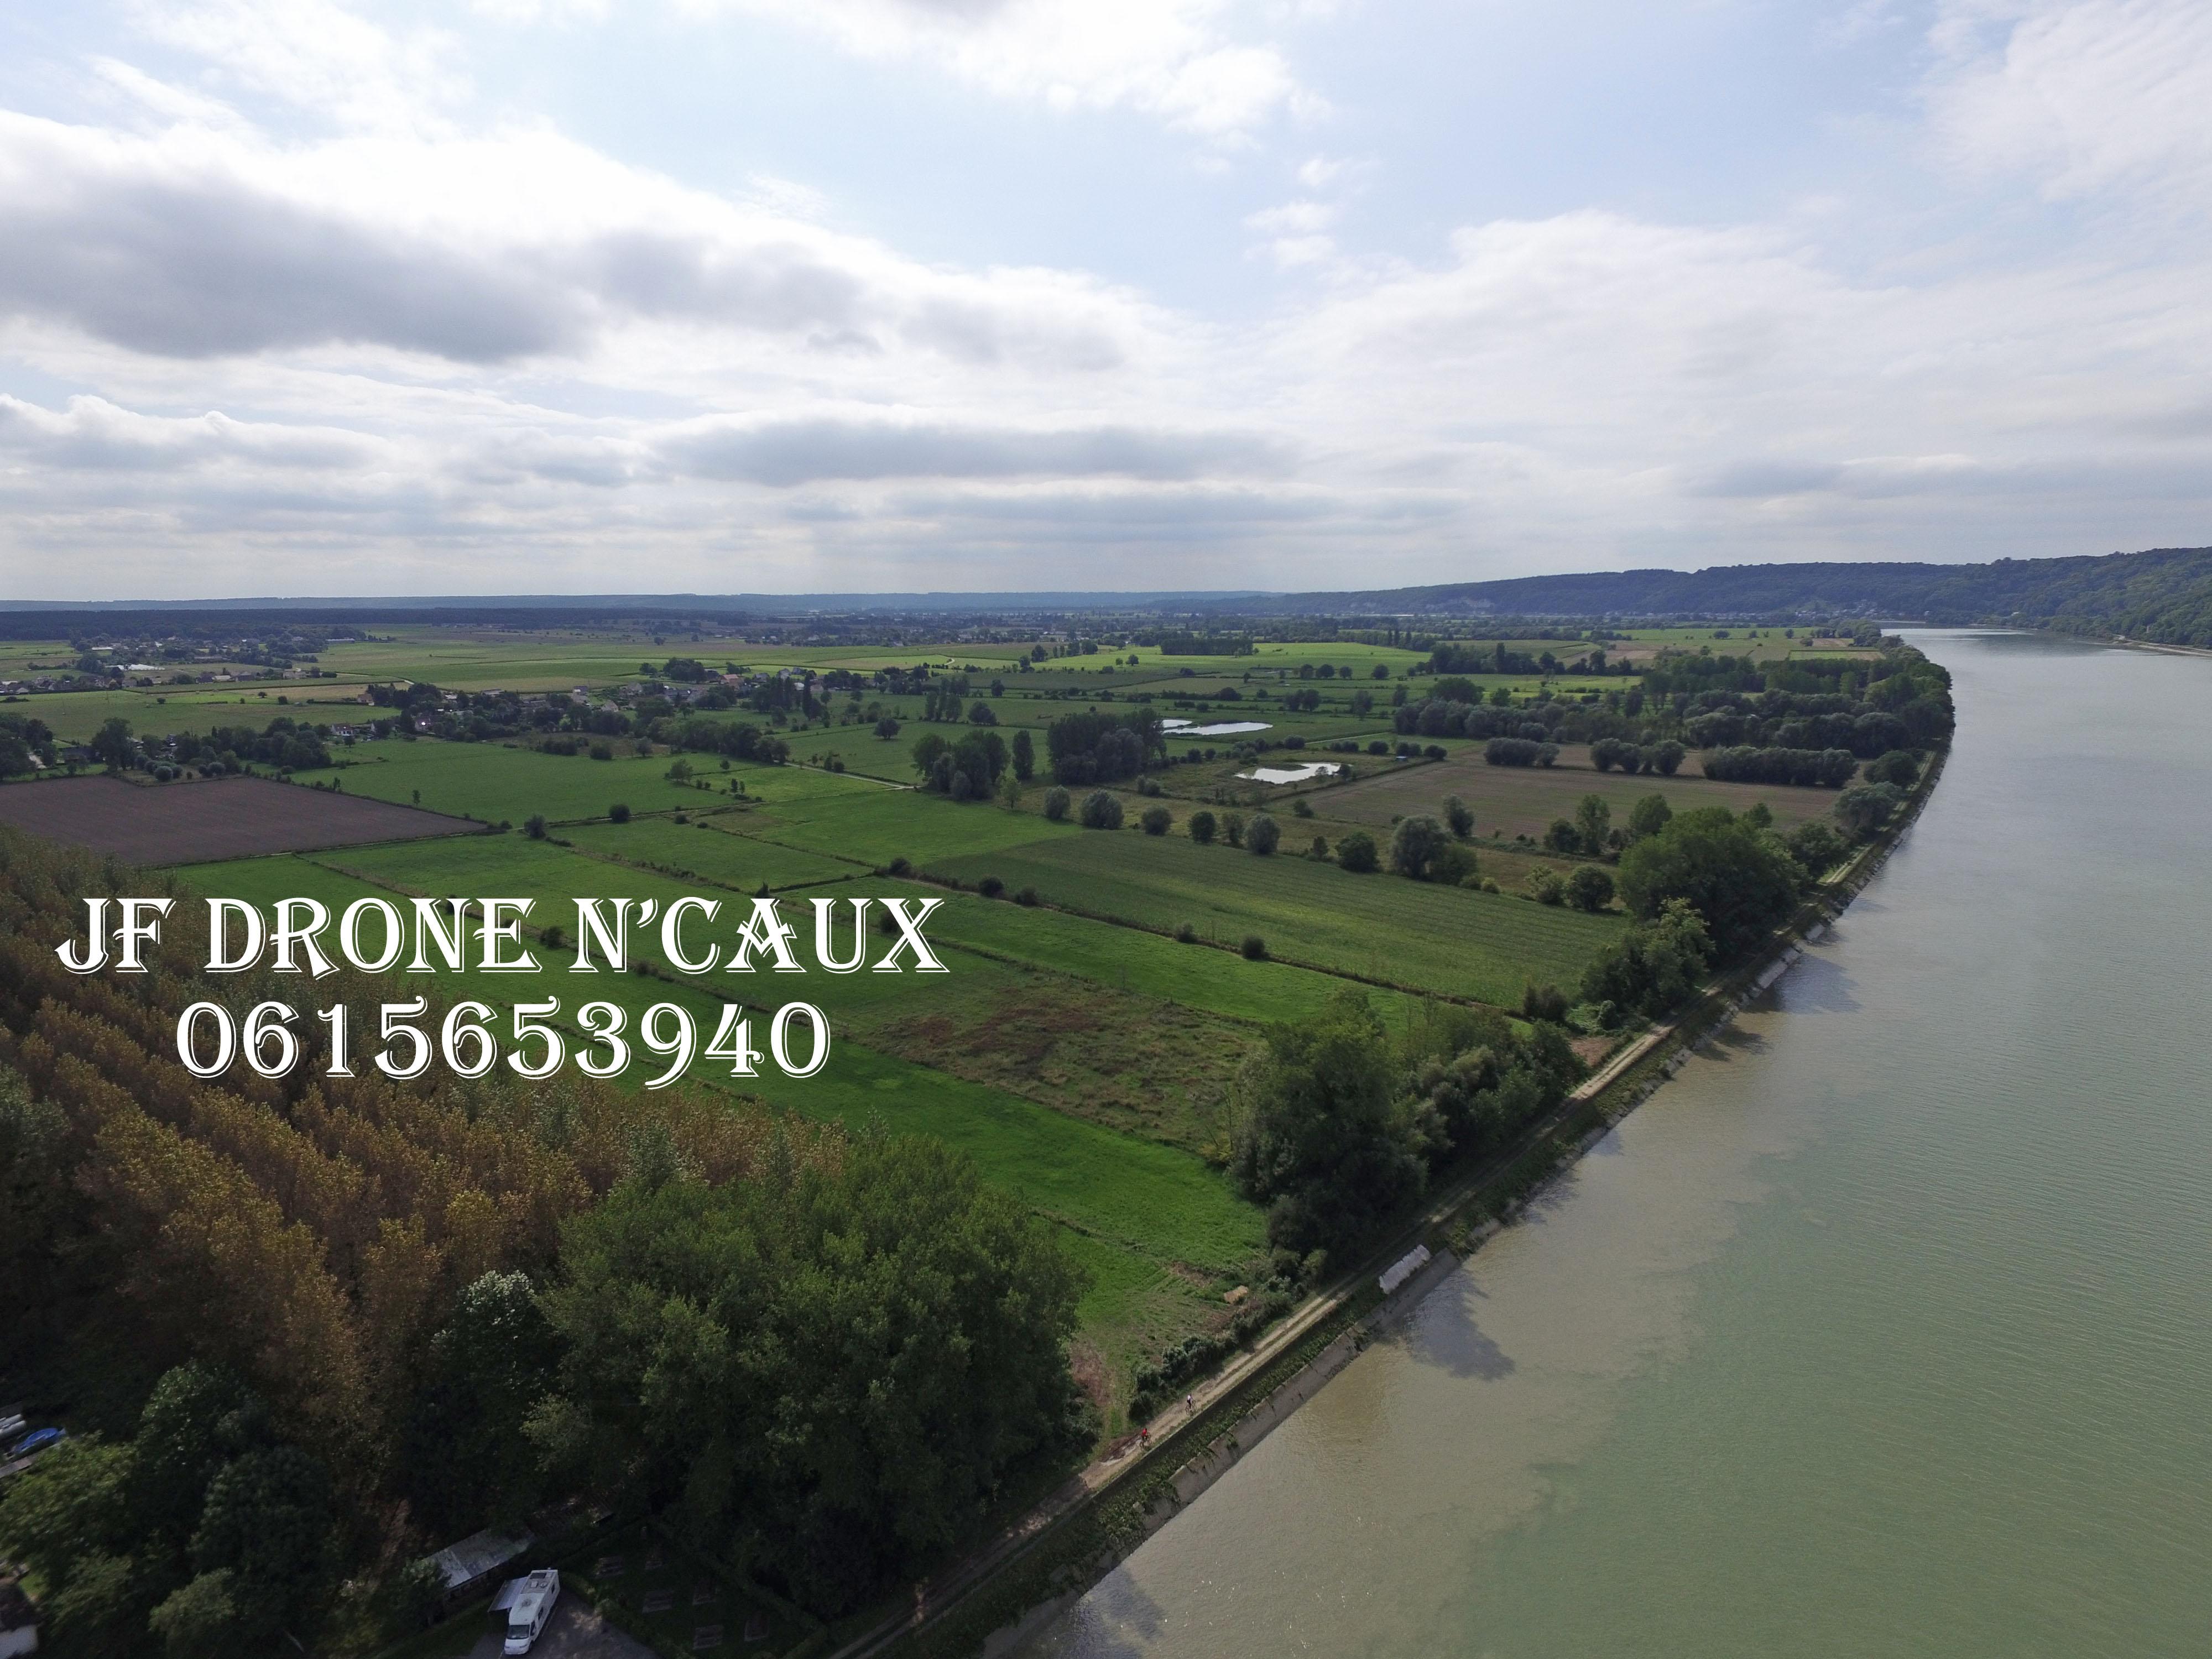 JF DRONE N'CAUX